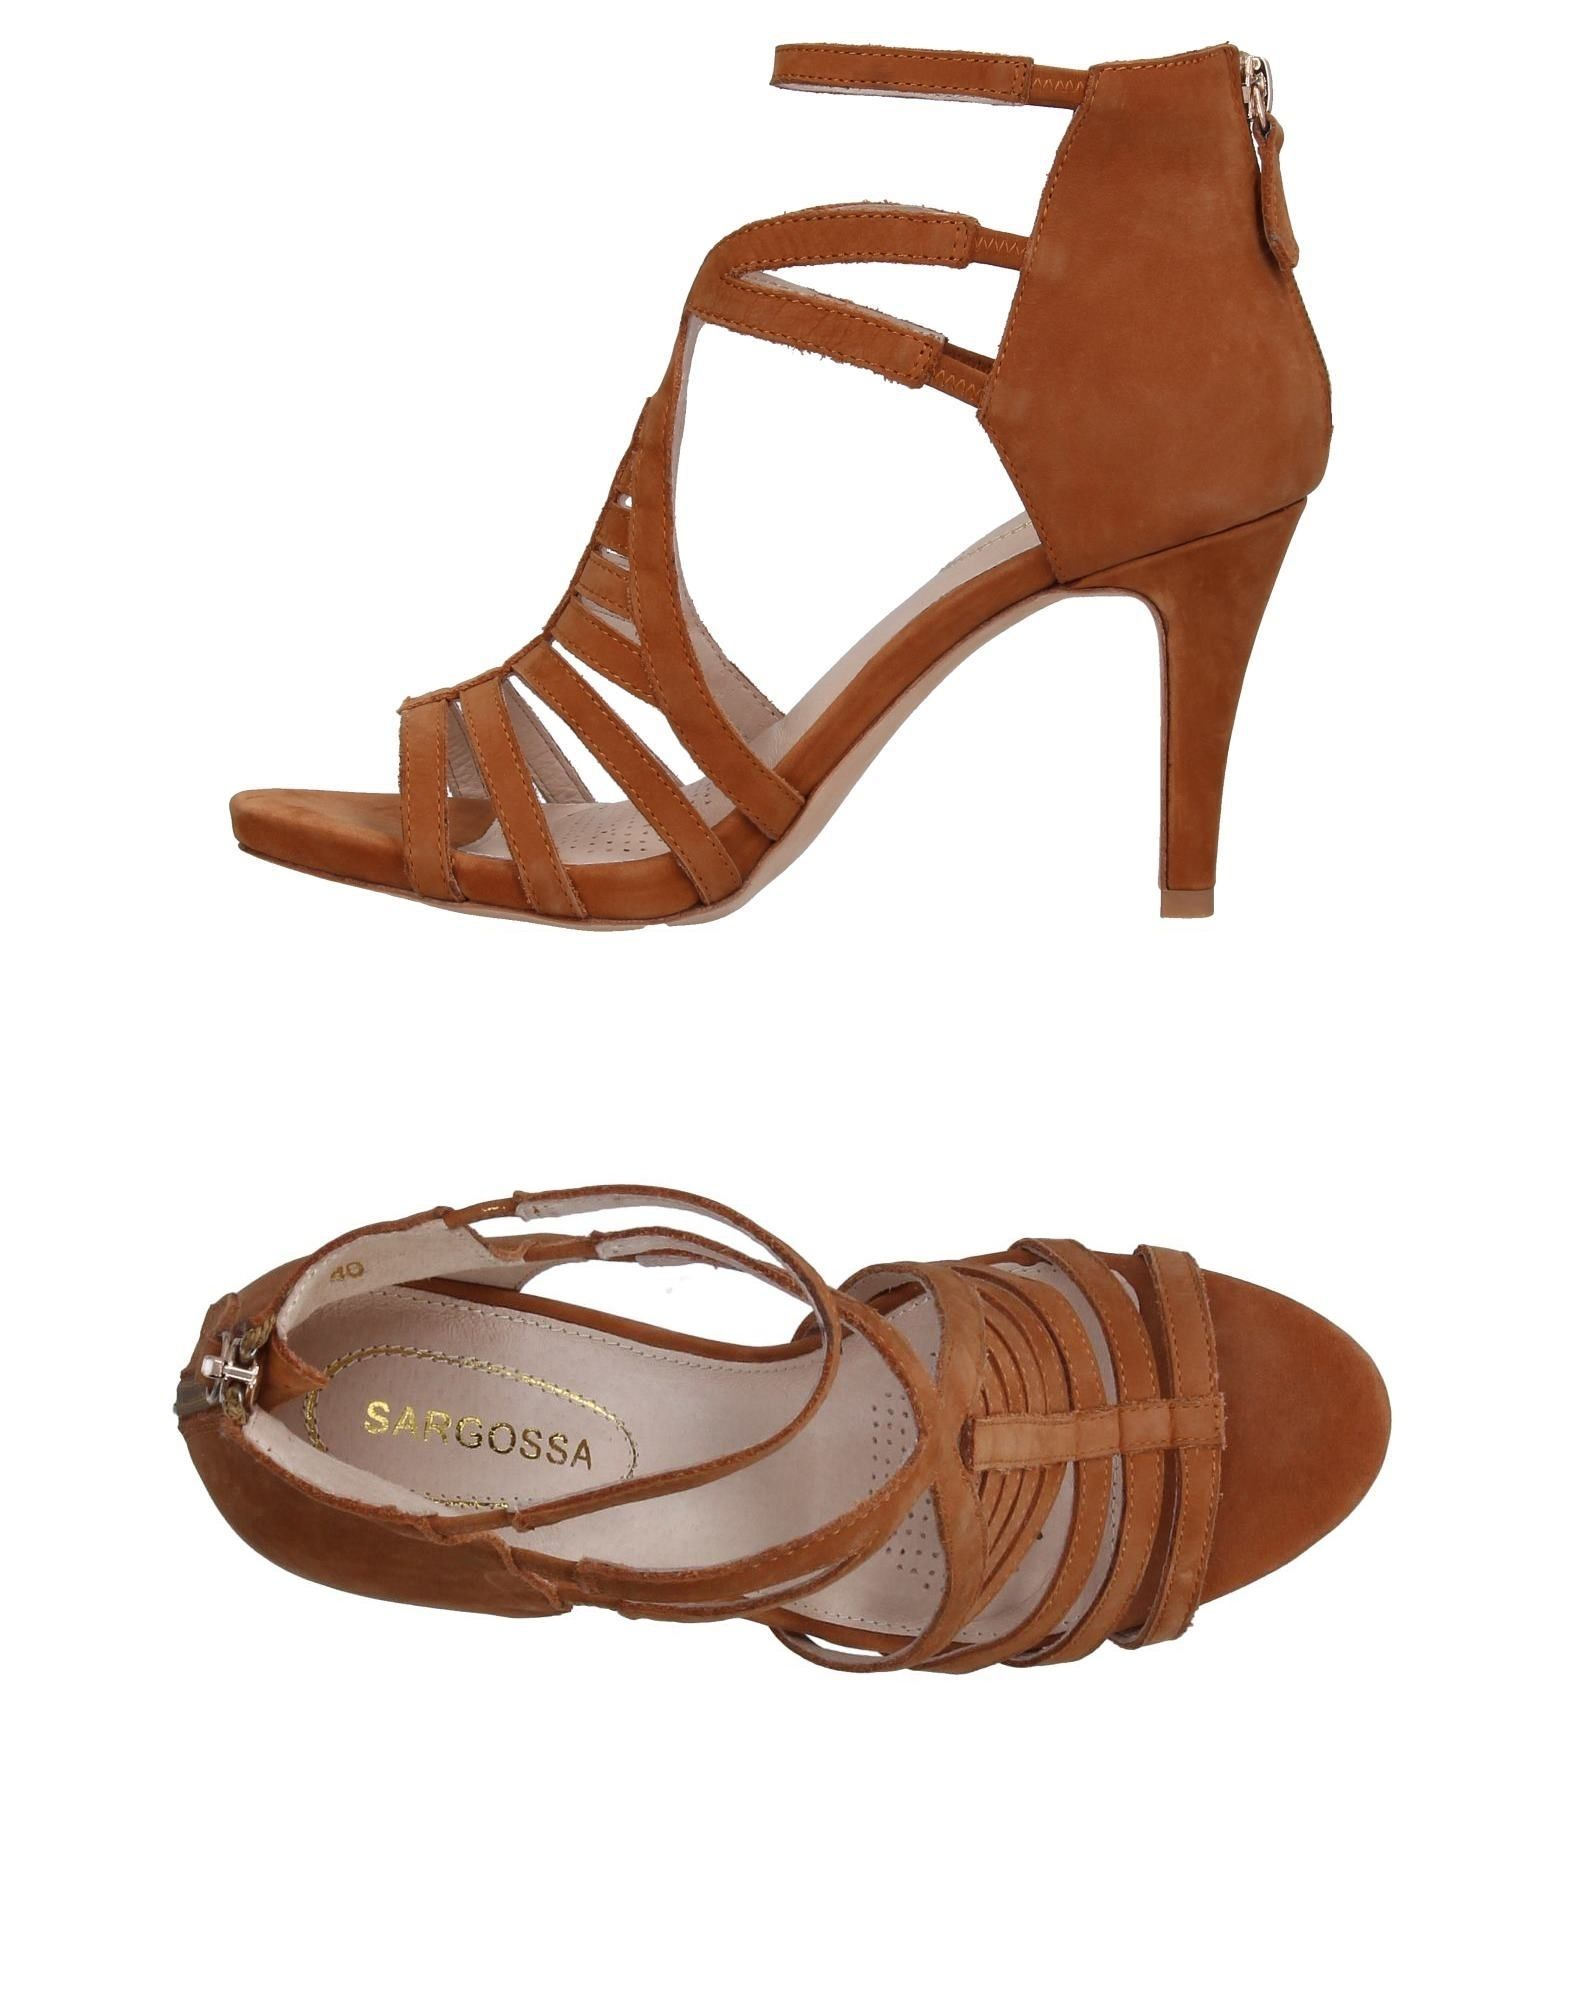 Sandales Sargossa Femme - Sandales Sargossa sur